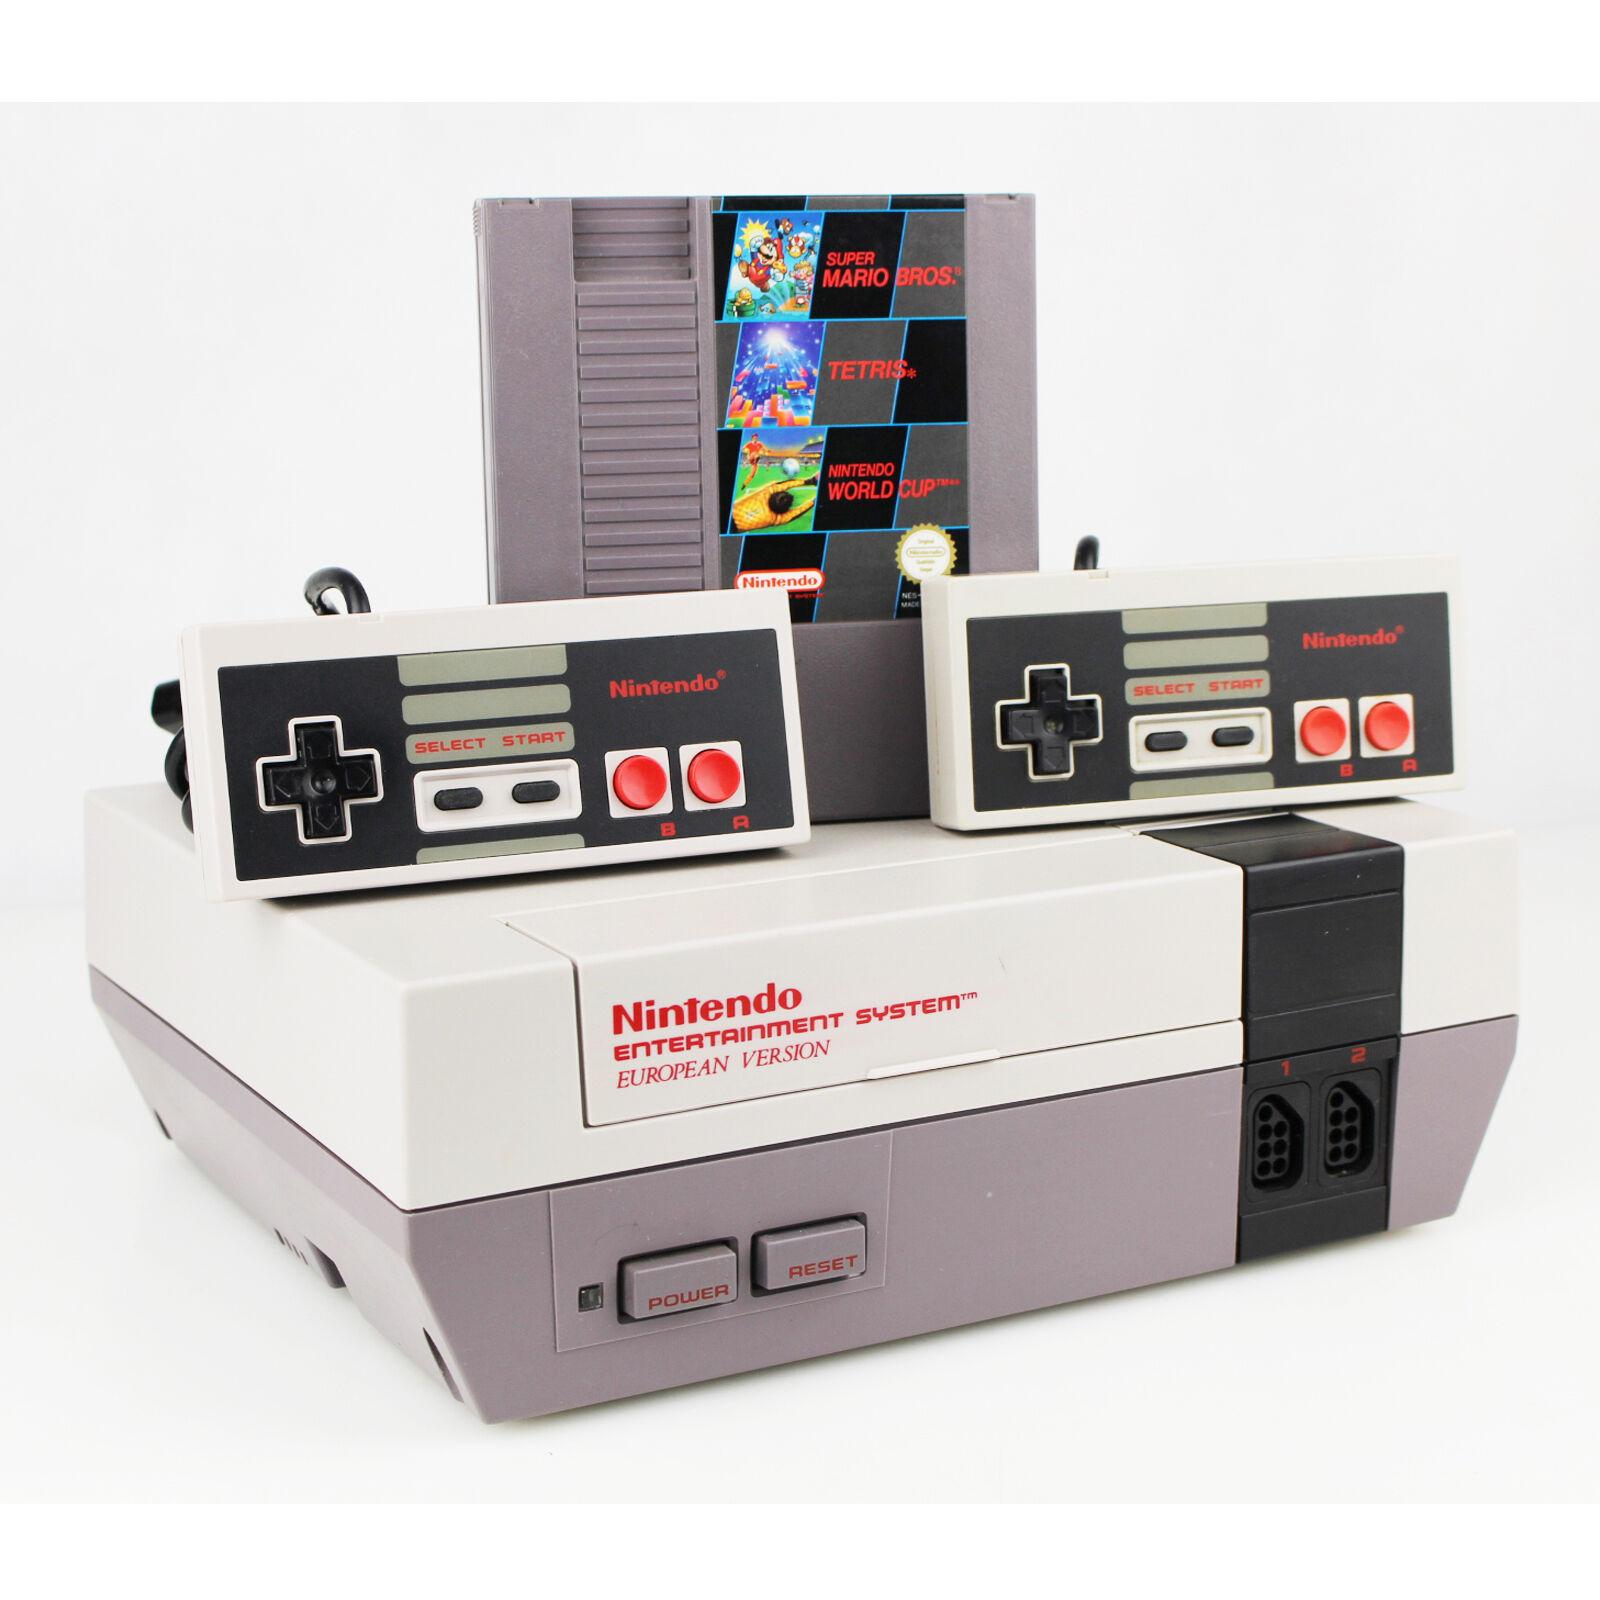 Nintendo Nes Konsole Pal 3in1 Spiel Mario Bros. Tetris World Cup + 2 Controller